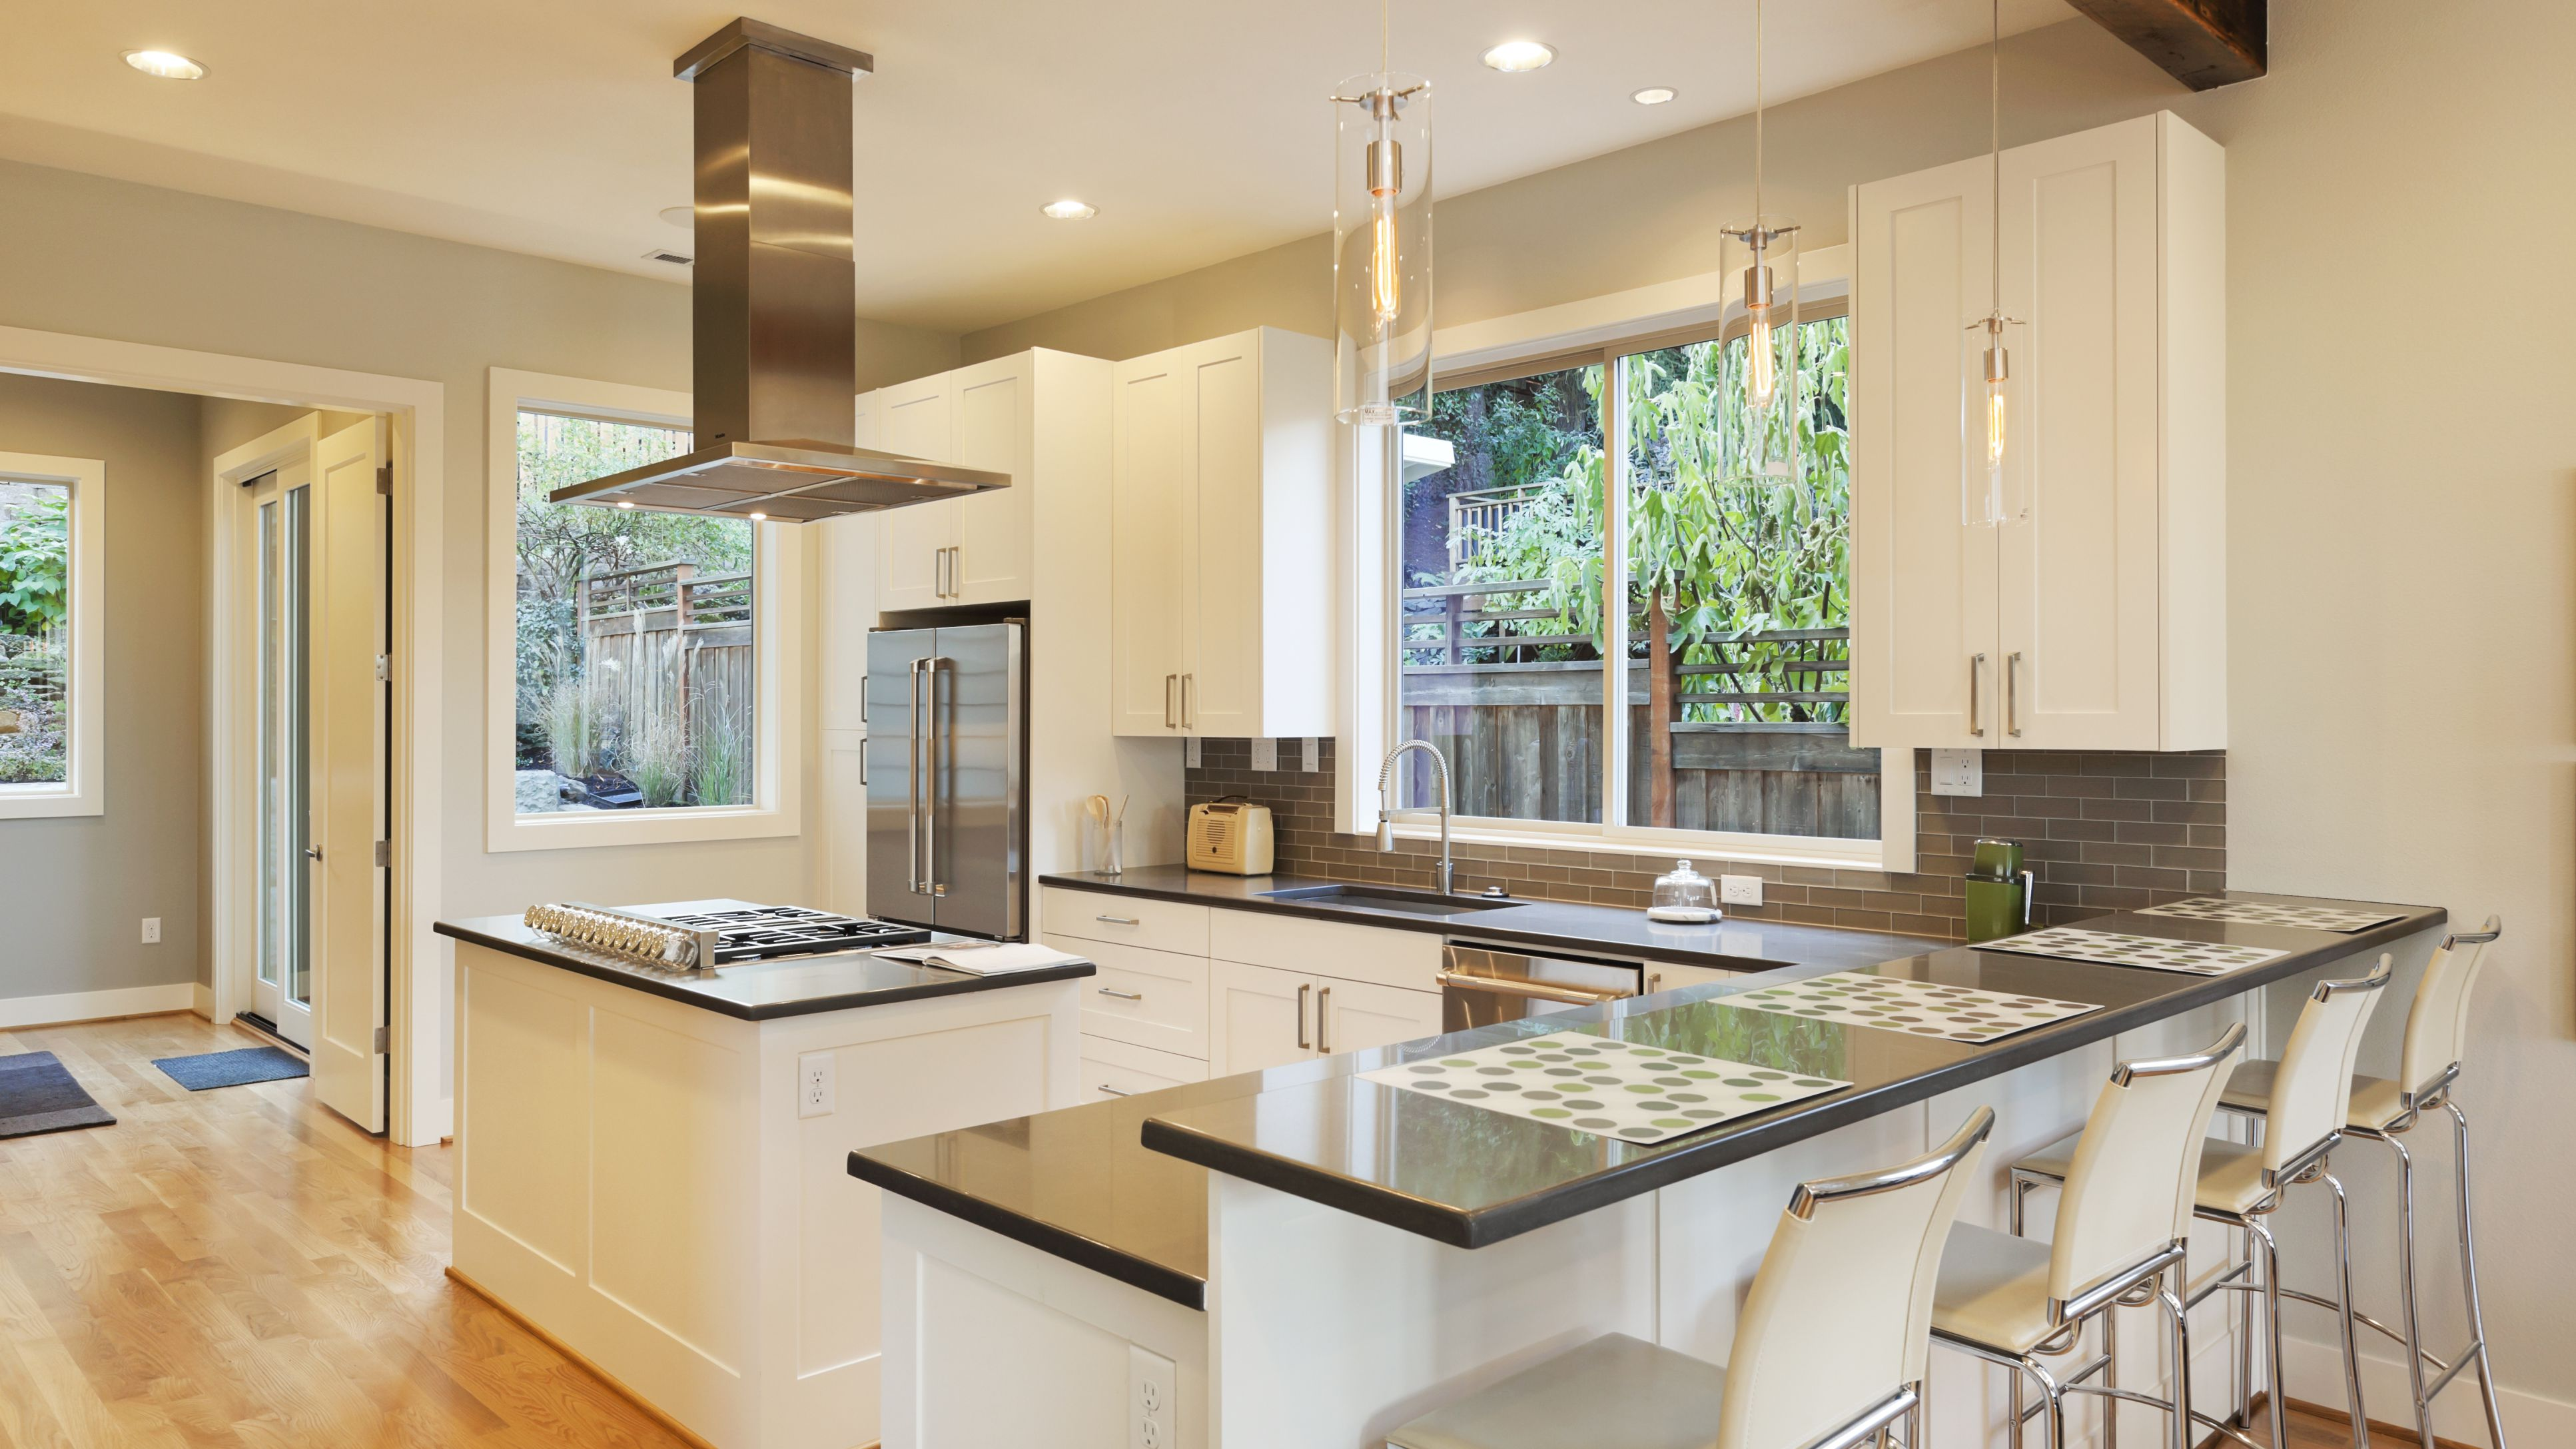 Kitchen E Design Recommendations